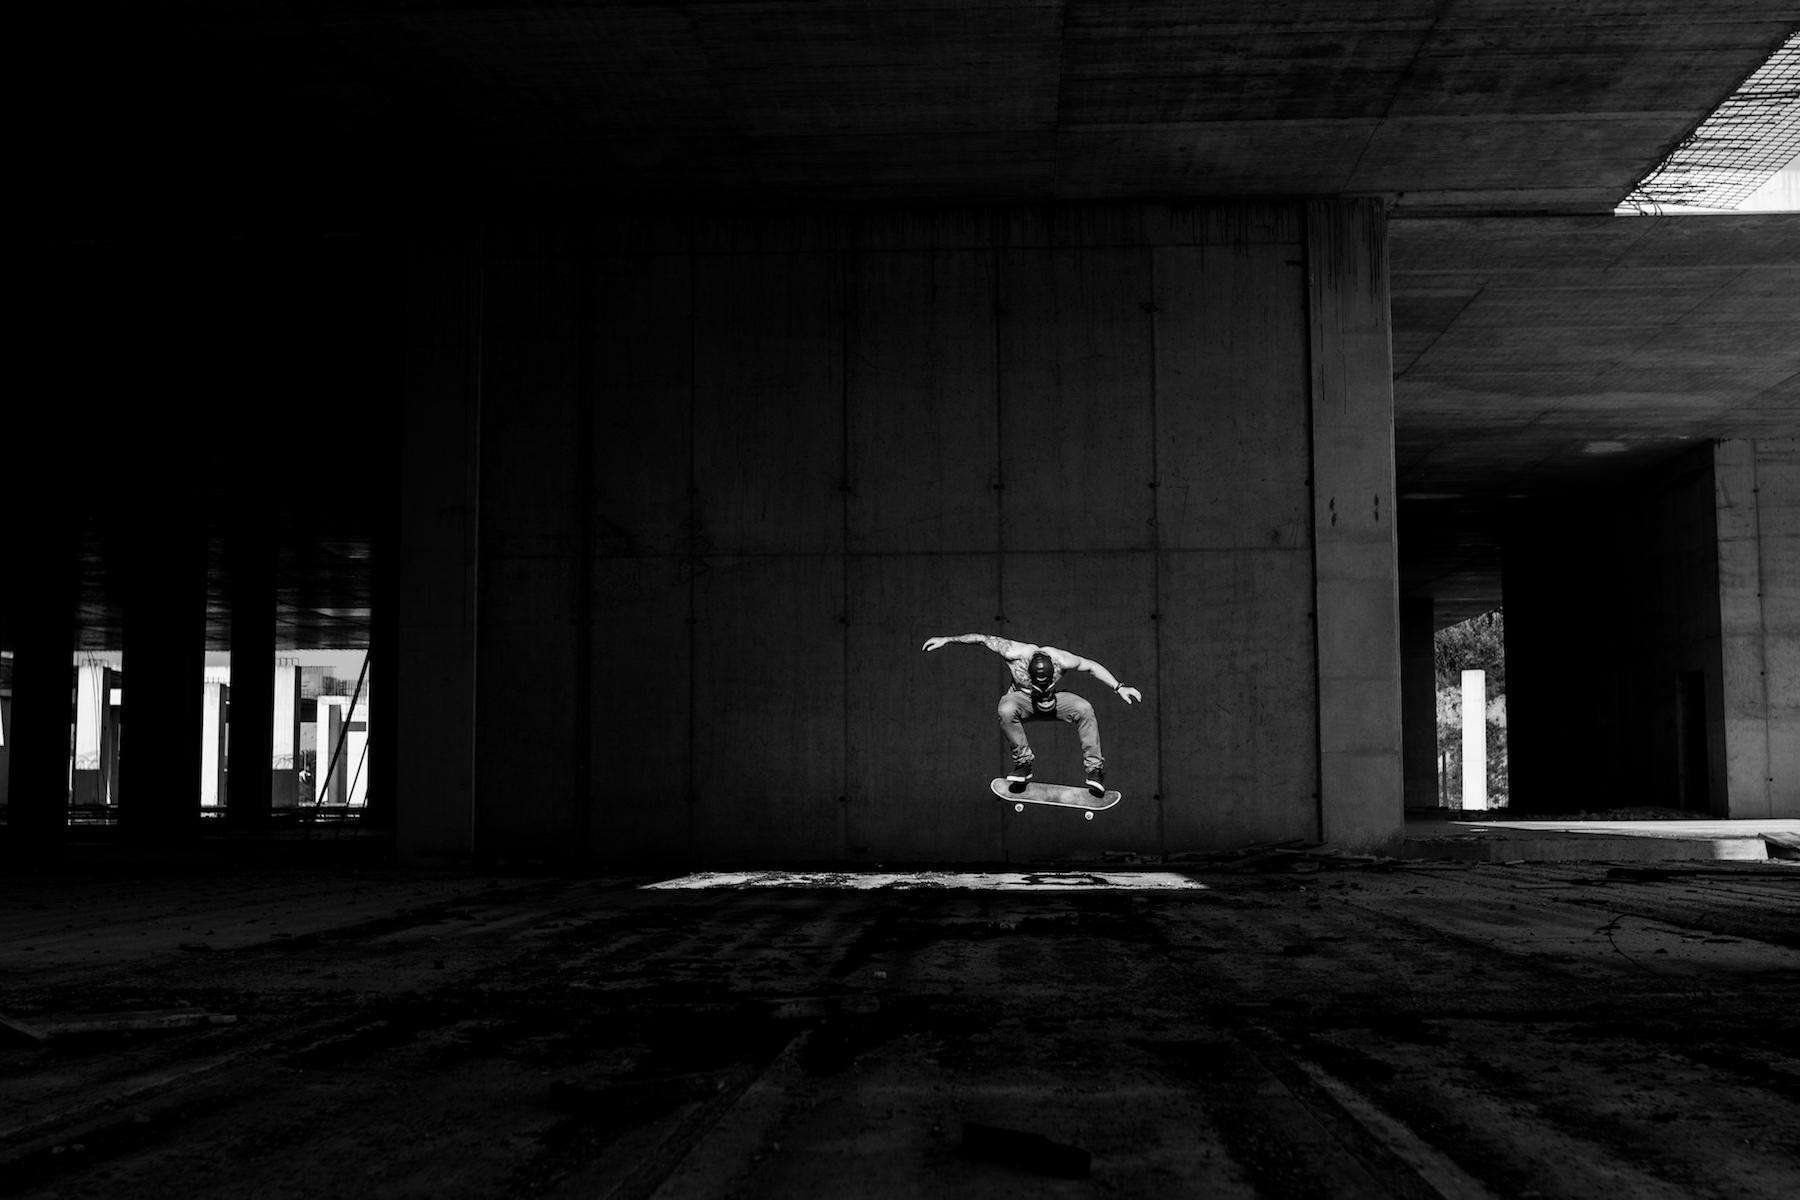 luke-paige-skate-photography-13